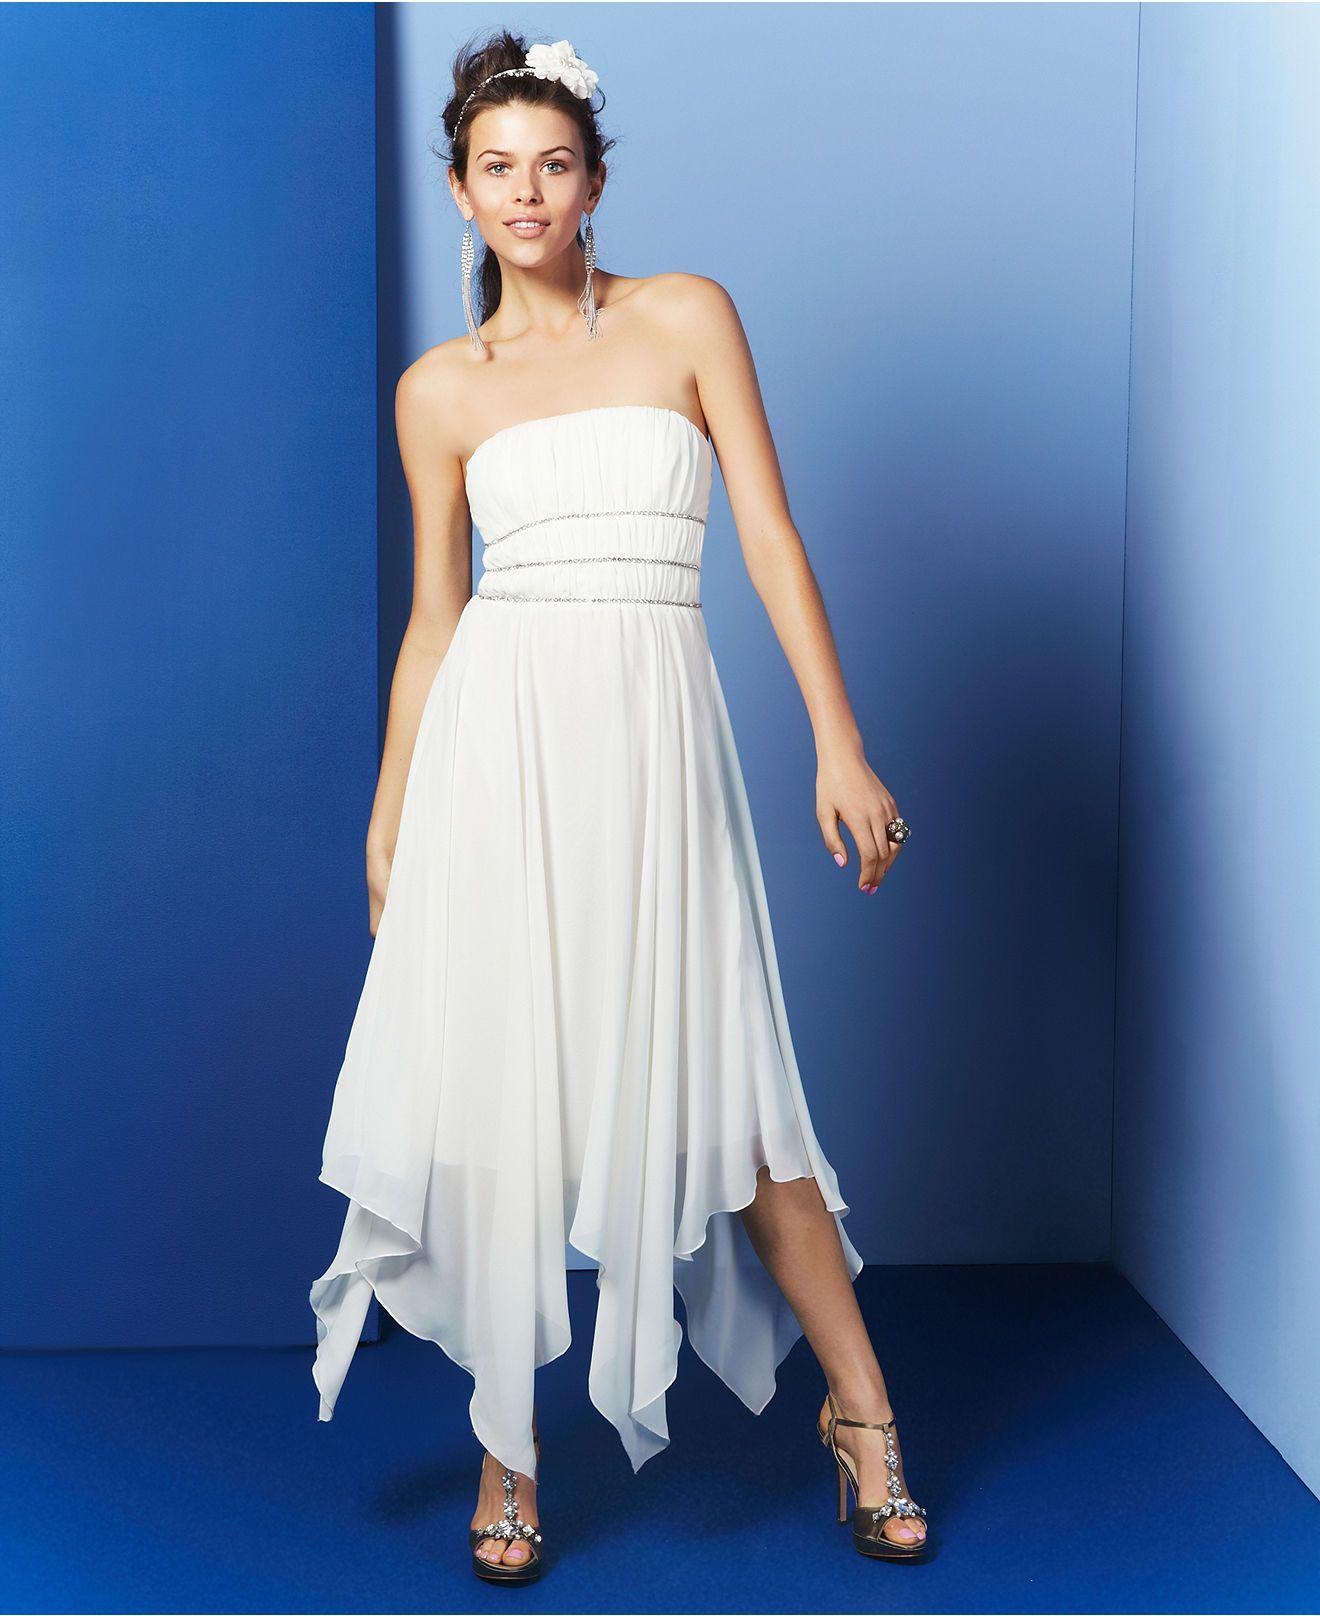 Macyus strapless hankerchief chiffon trixxi dress where to find